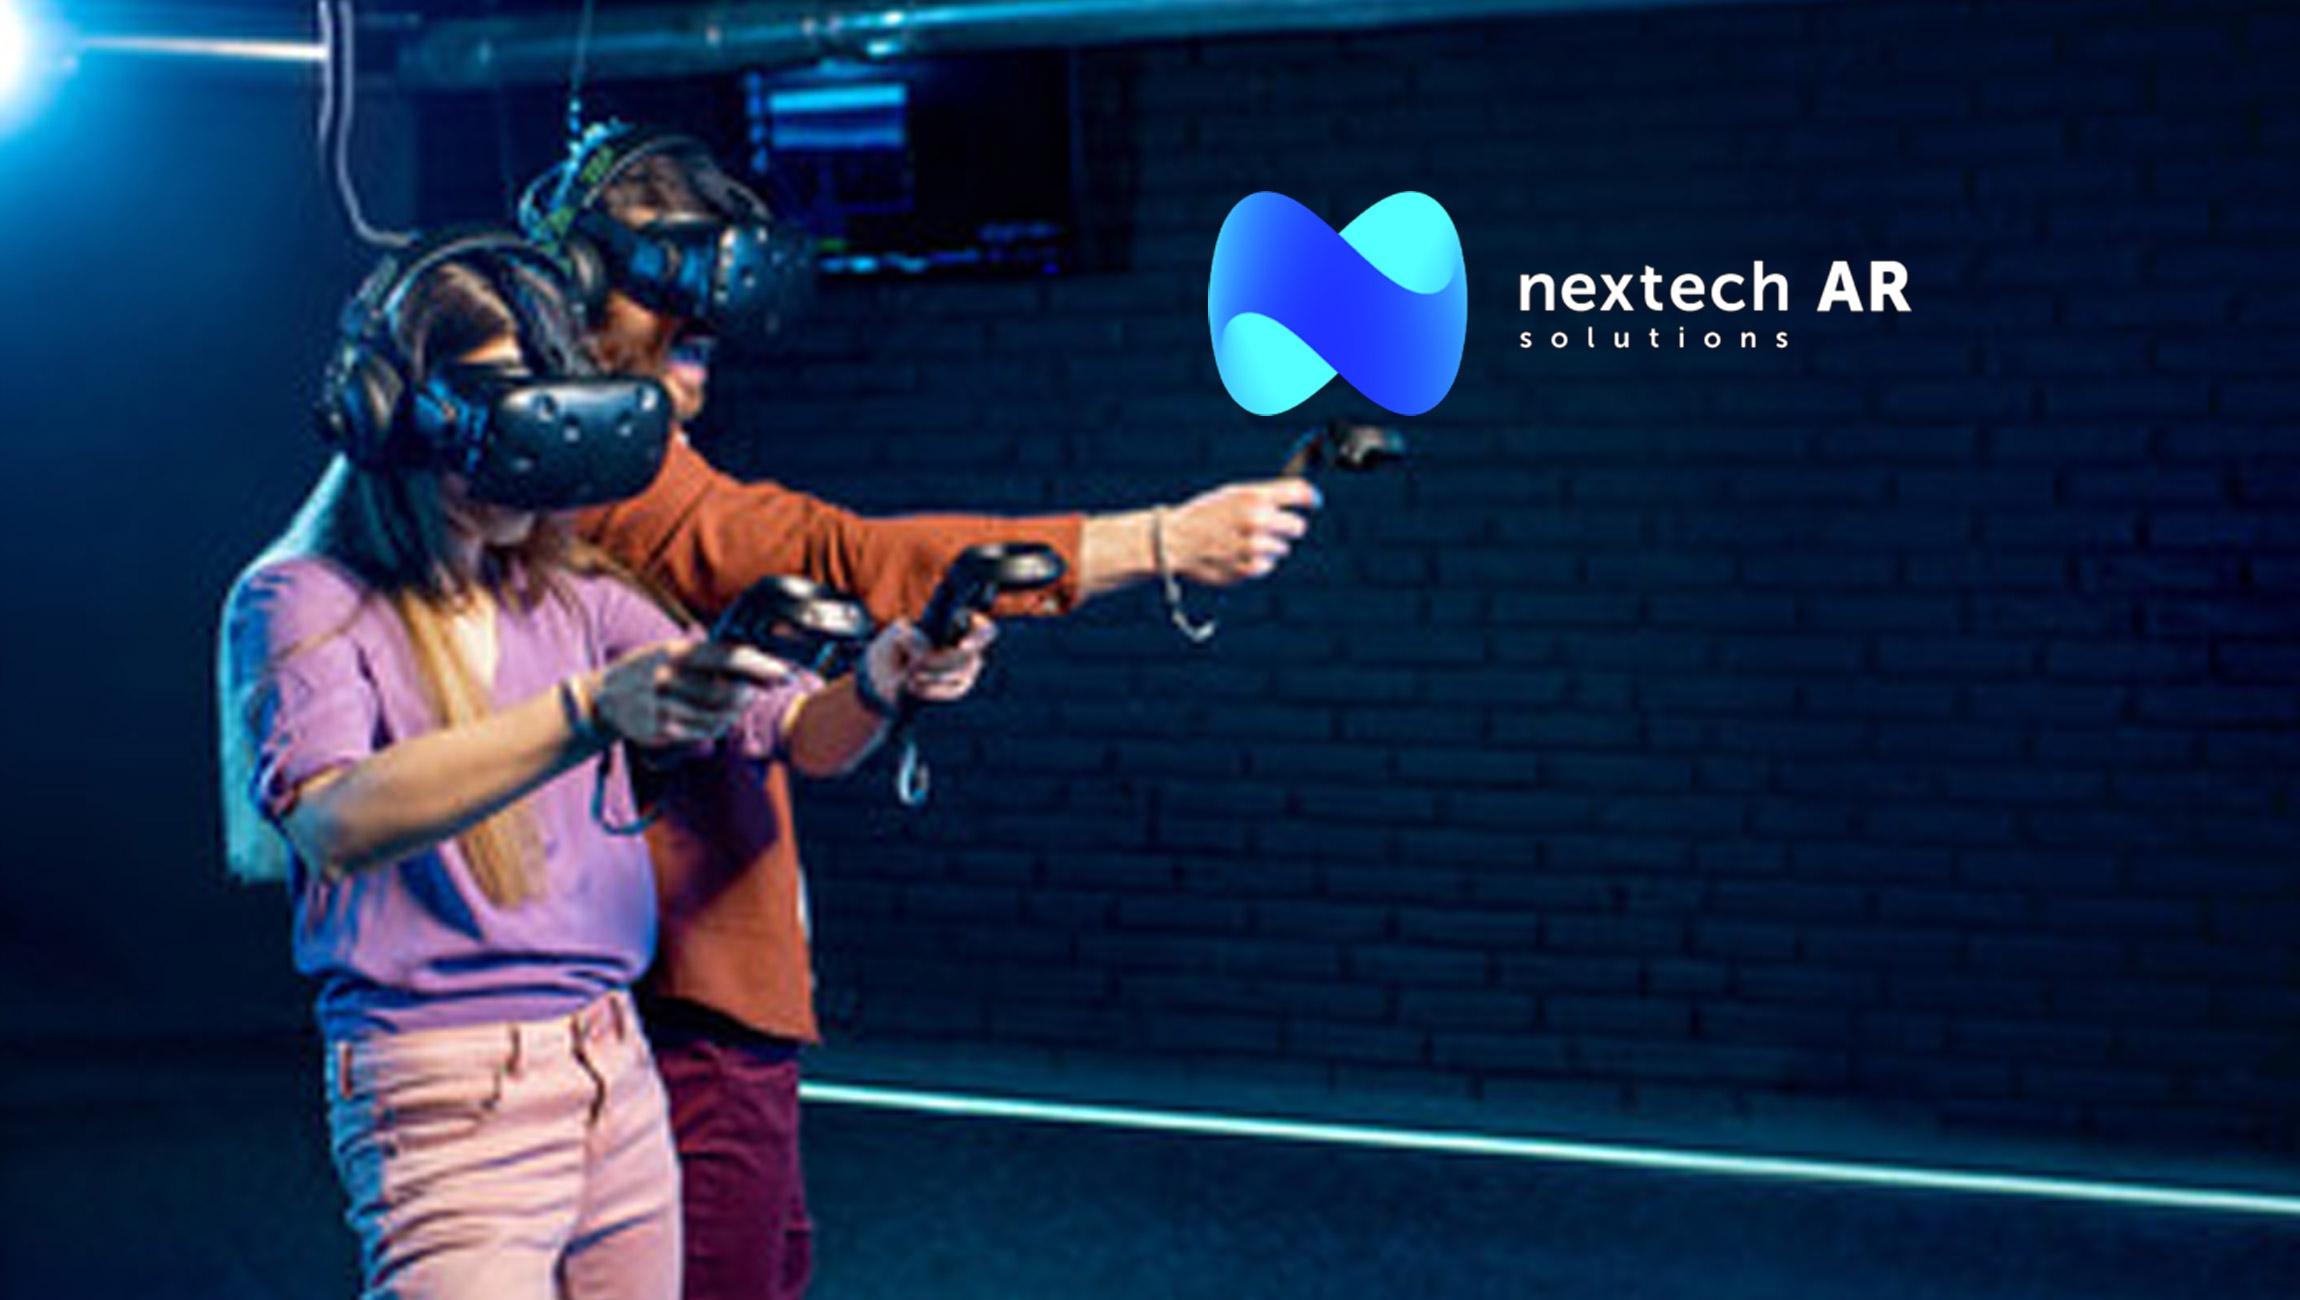 Nextech to Launch Augmented Reality NFT Hologram Creator Platform